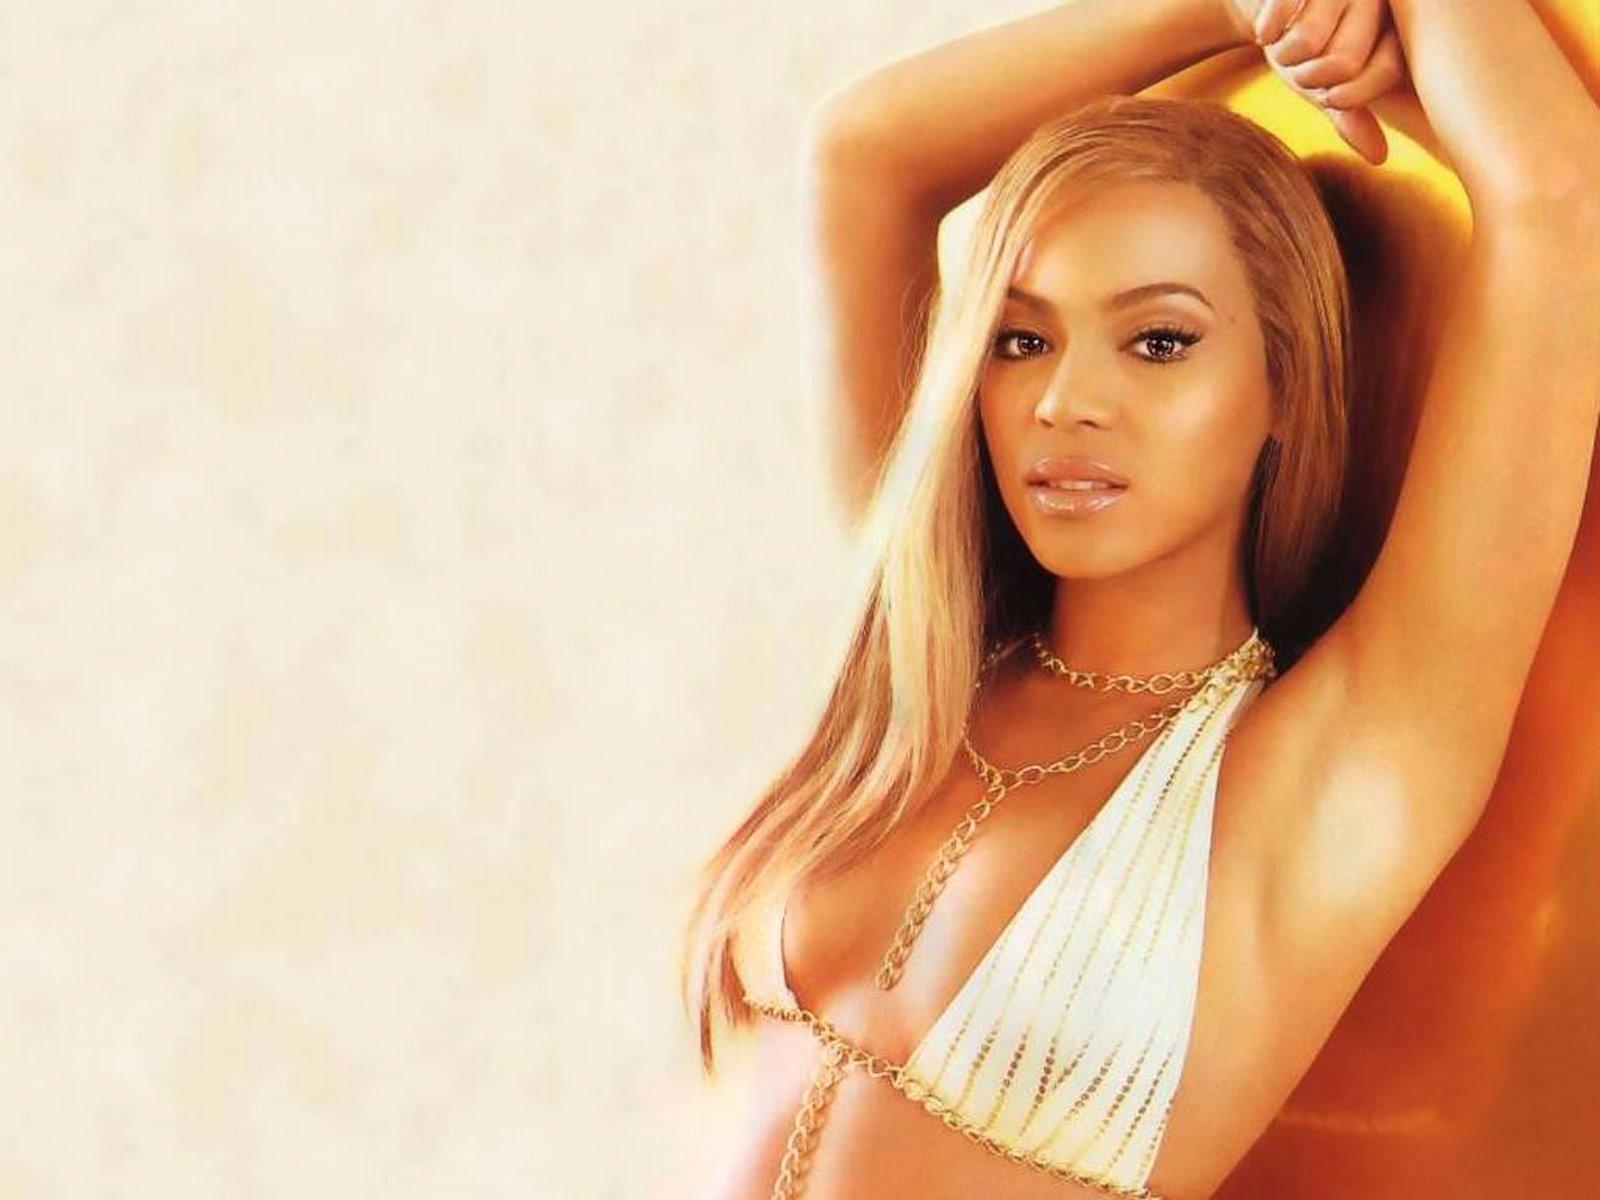 http://2.bp.blogspot.com/_kz5tggJUhu8/Ry8Nx18ploI/AAAAAAAAAFs/bLHlx-X6YHg/s1600/Beyonce+Knowles+3.jpg